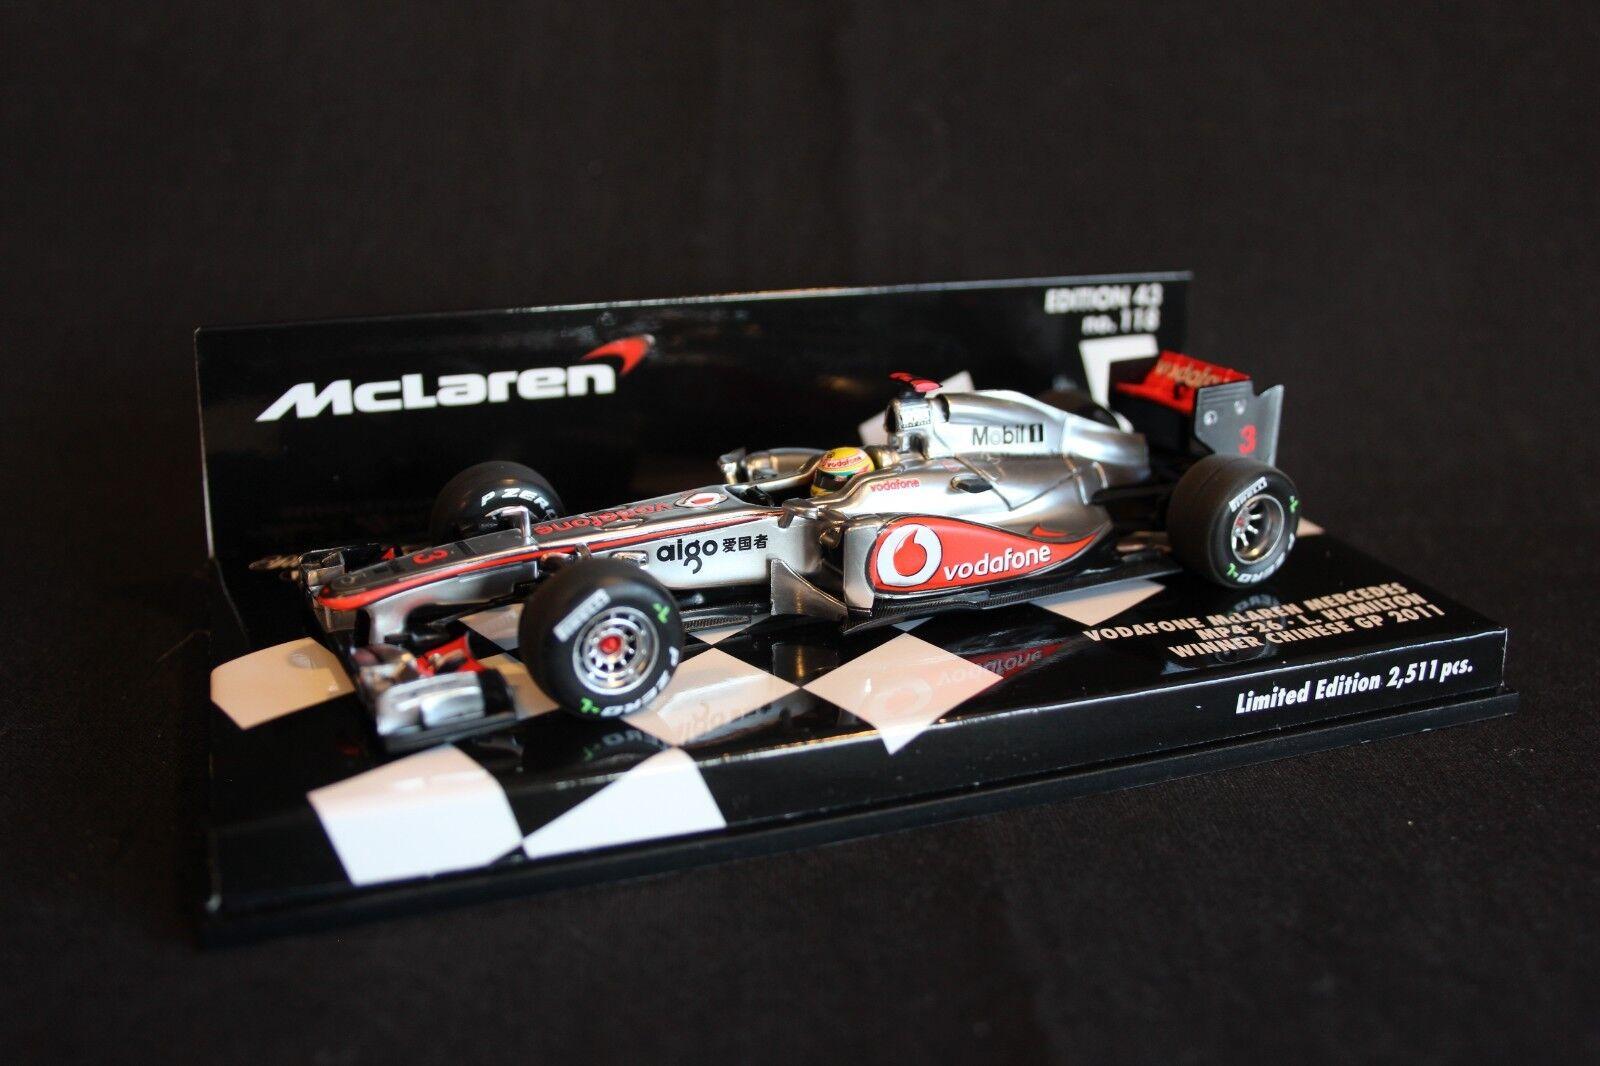 Minichamps McLaren Mercedes MP4-26 2011 1 43 Lewis Hamilton (GBR)